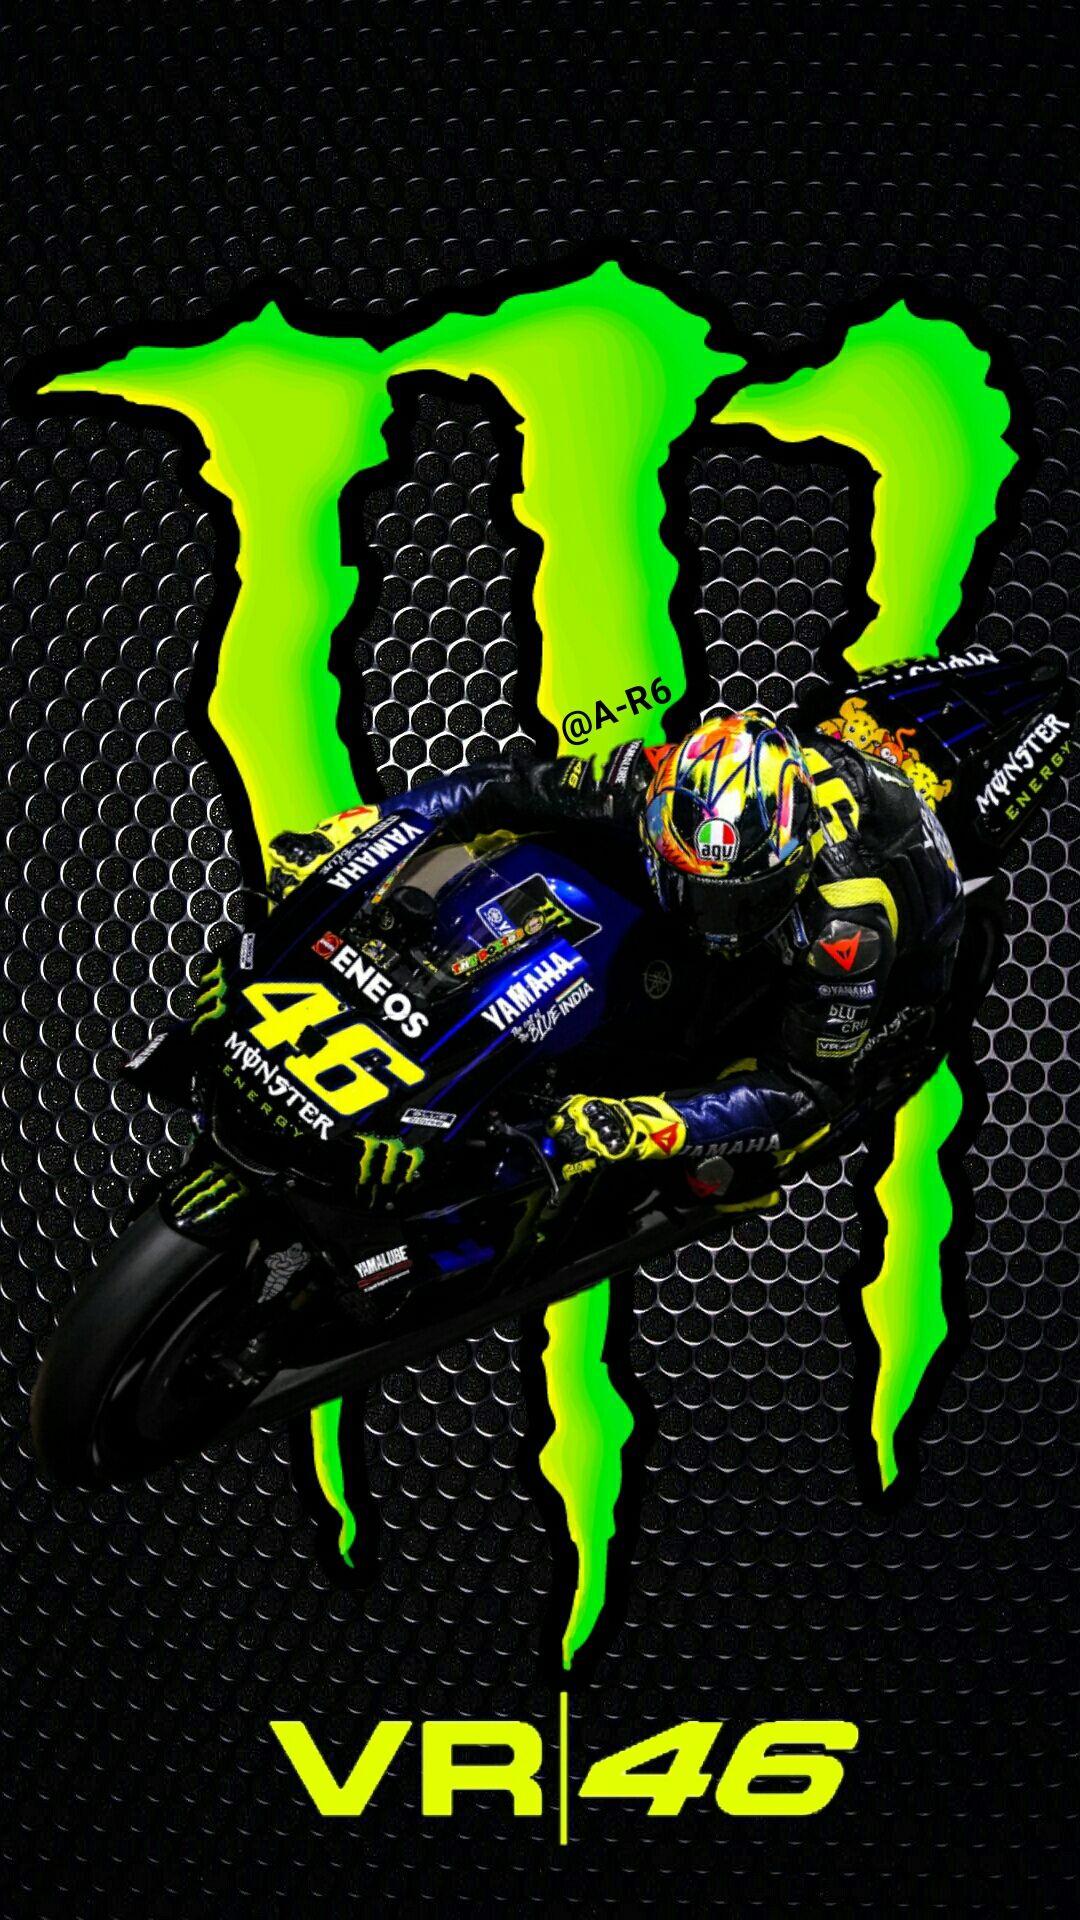 Valentino Rossi Vr46 Monster Energy 2019 Gambar Objek Gambar Seni Rupa